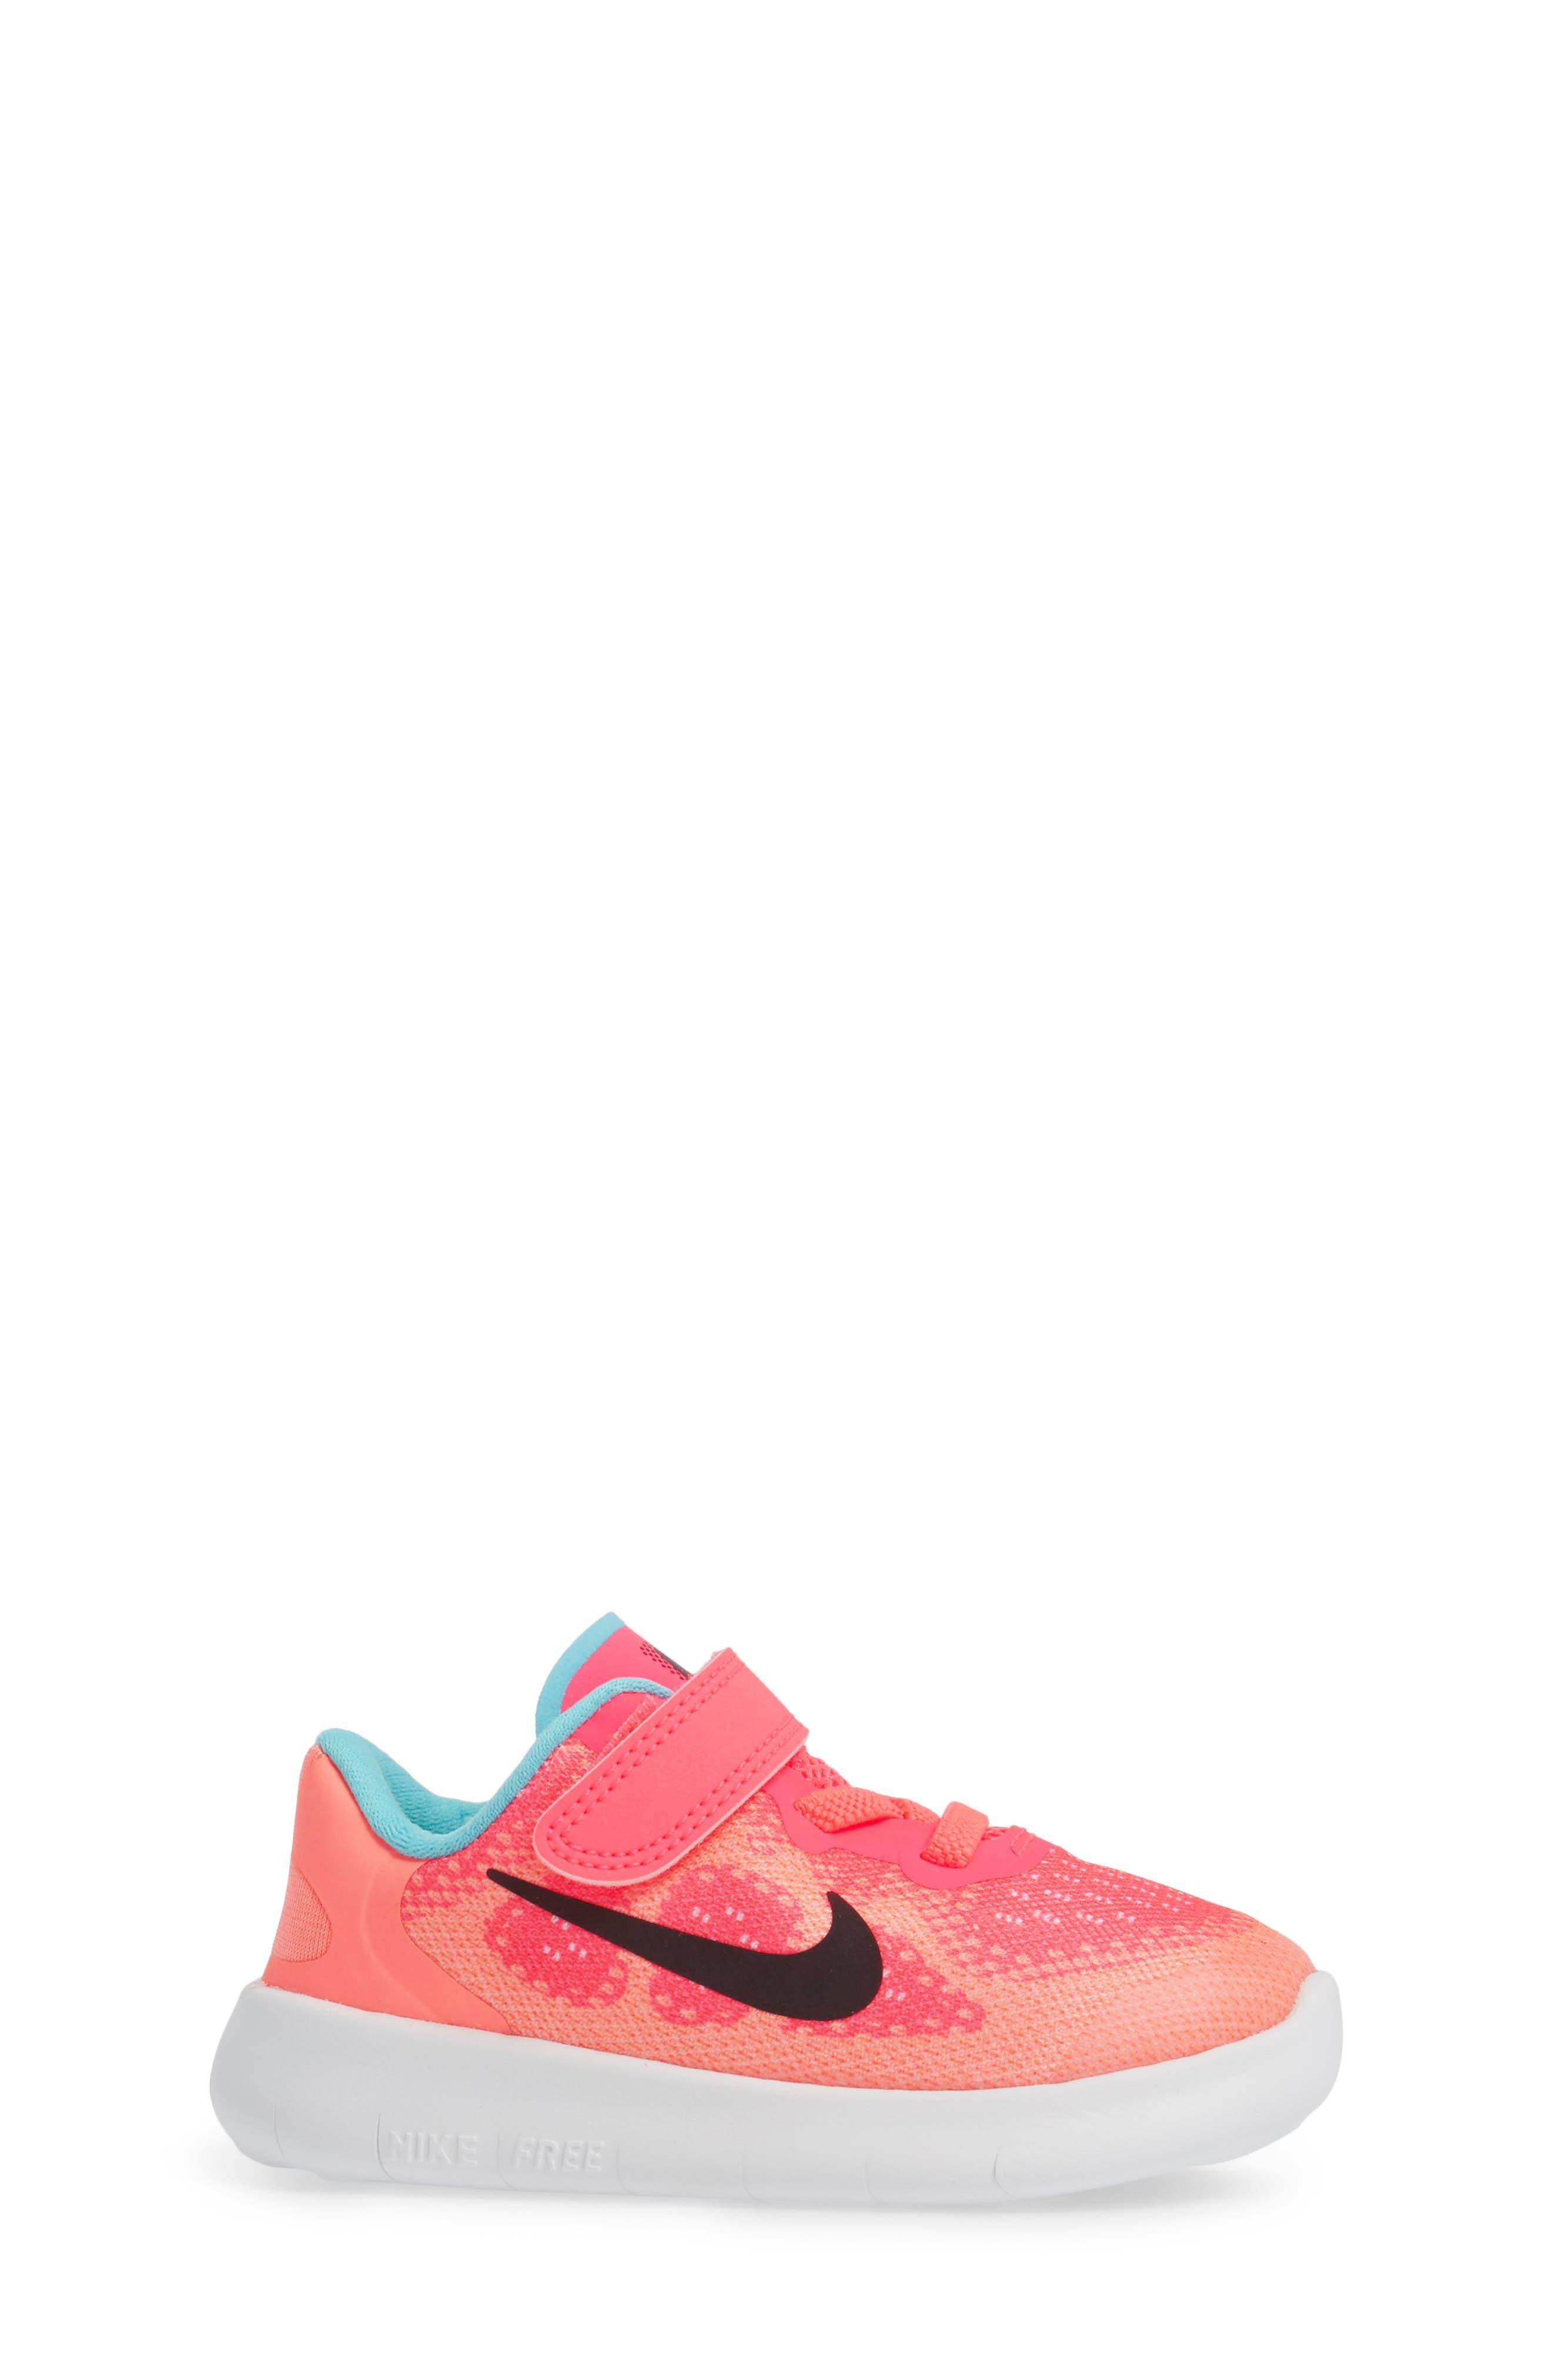 Free Run 2017 Sneaker,                             Alternate thumbnail 14, color,